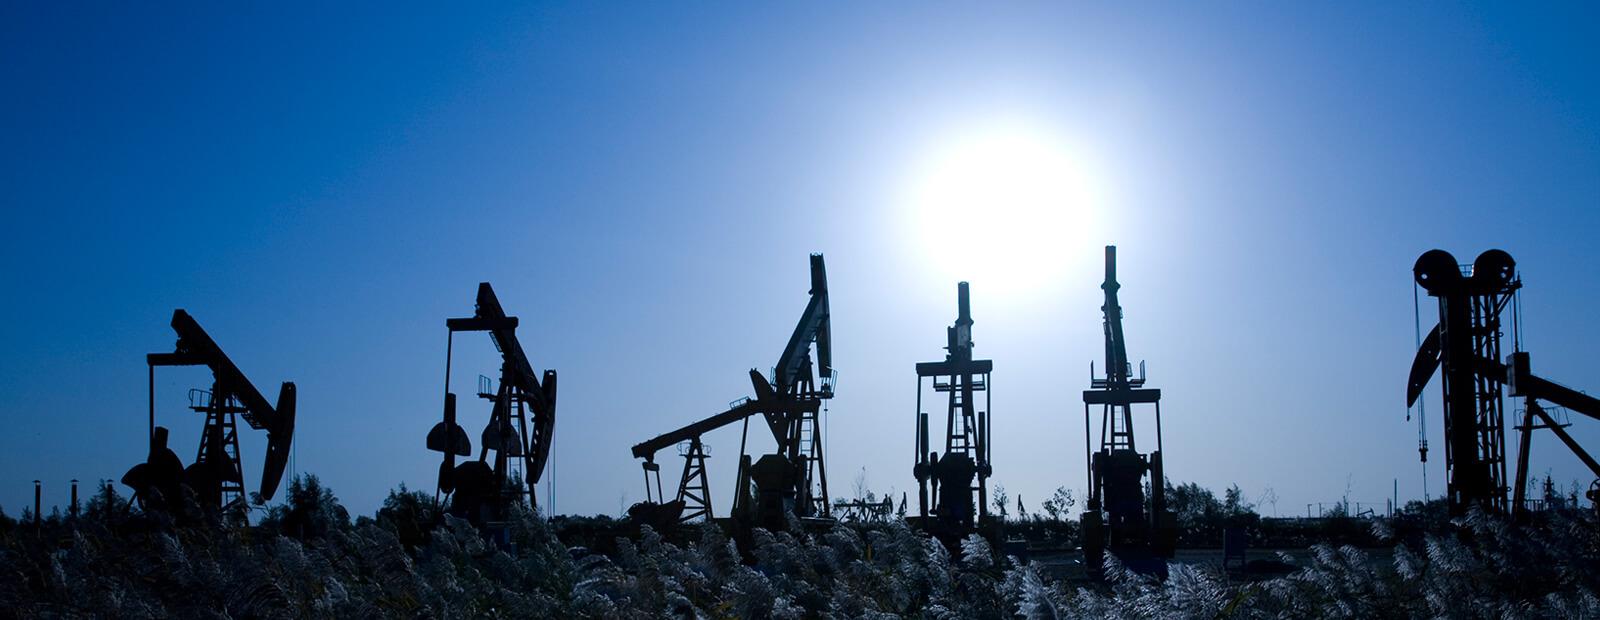 Under Balanced Drilling